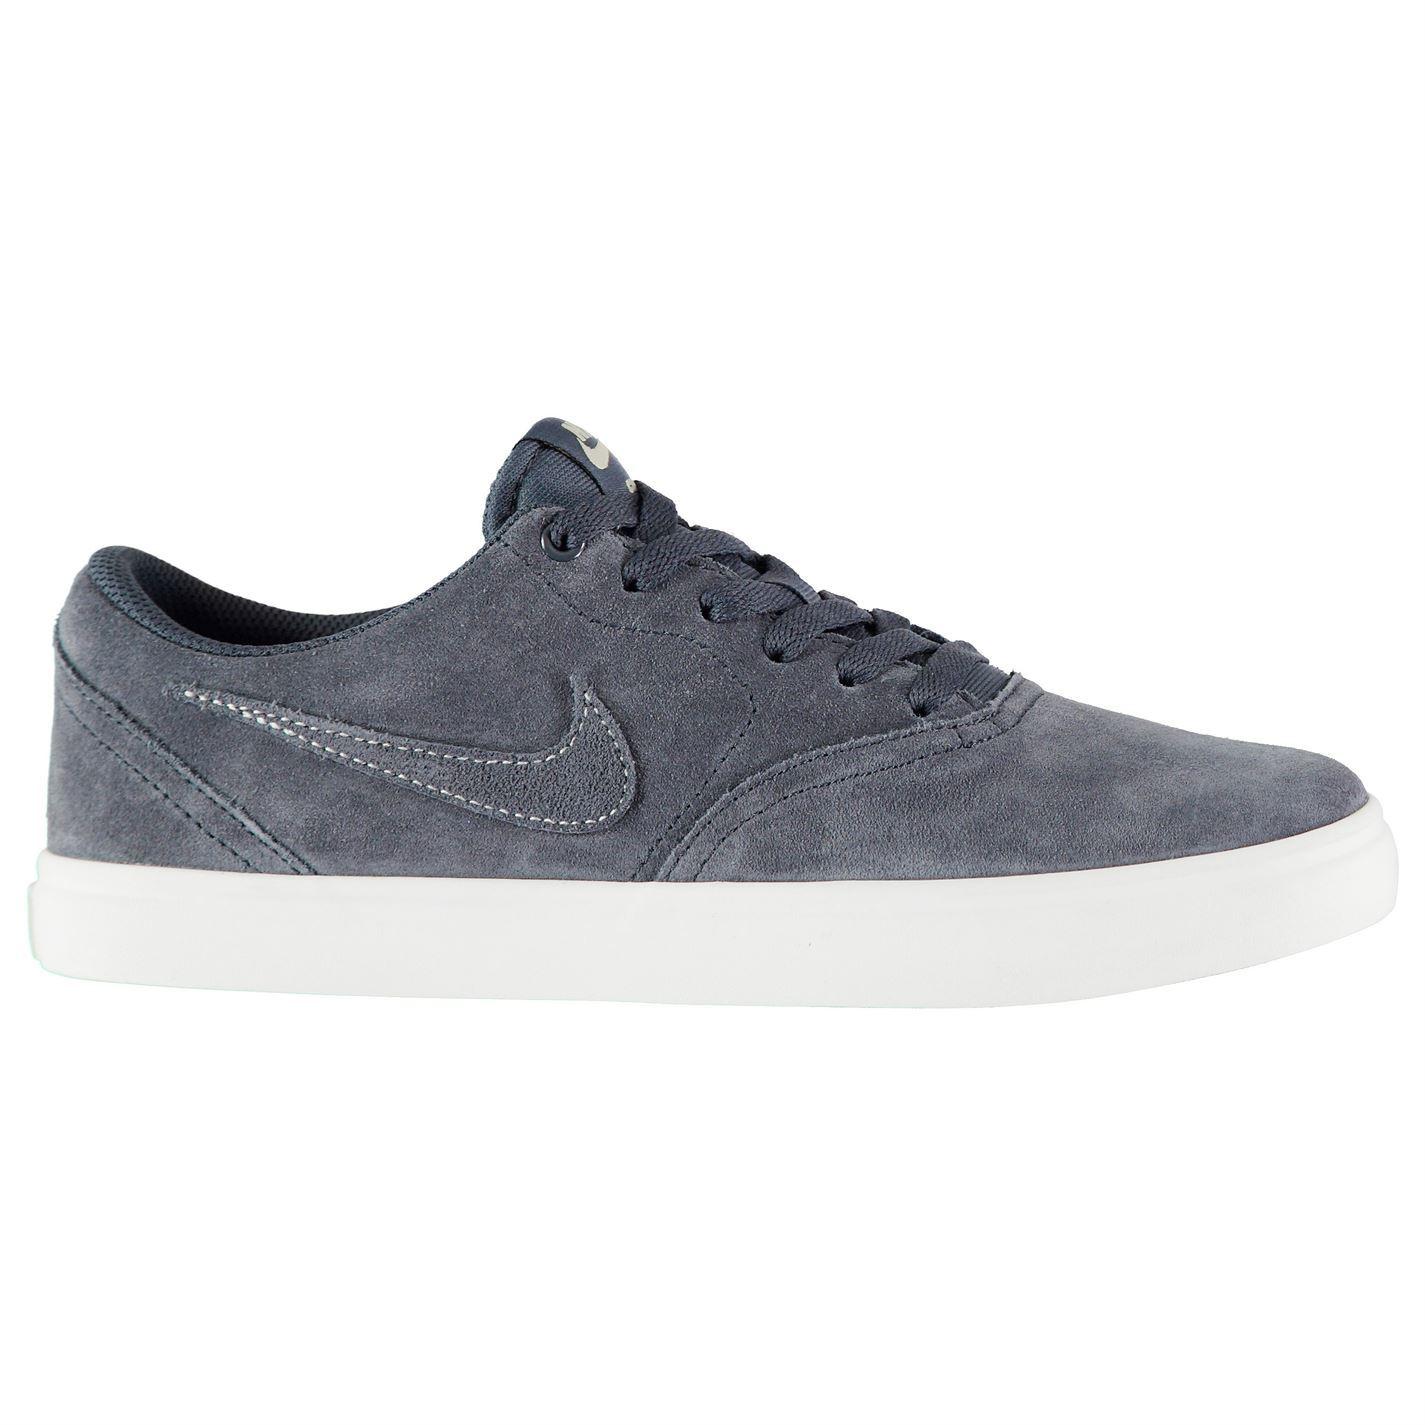 pretty nice 69e70 539de ... promo code for nike sb check solar soft skate shoes mens blue  skateboarding trainers sneakers quality